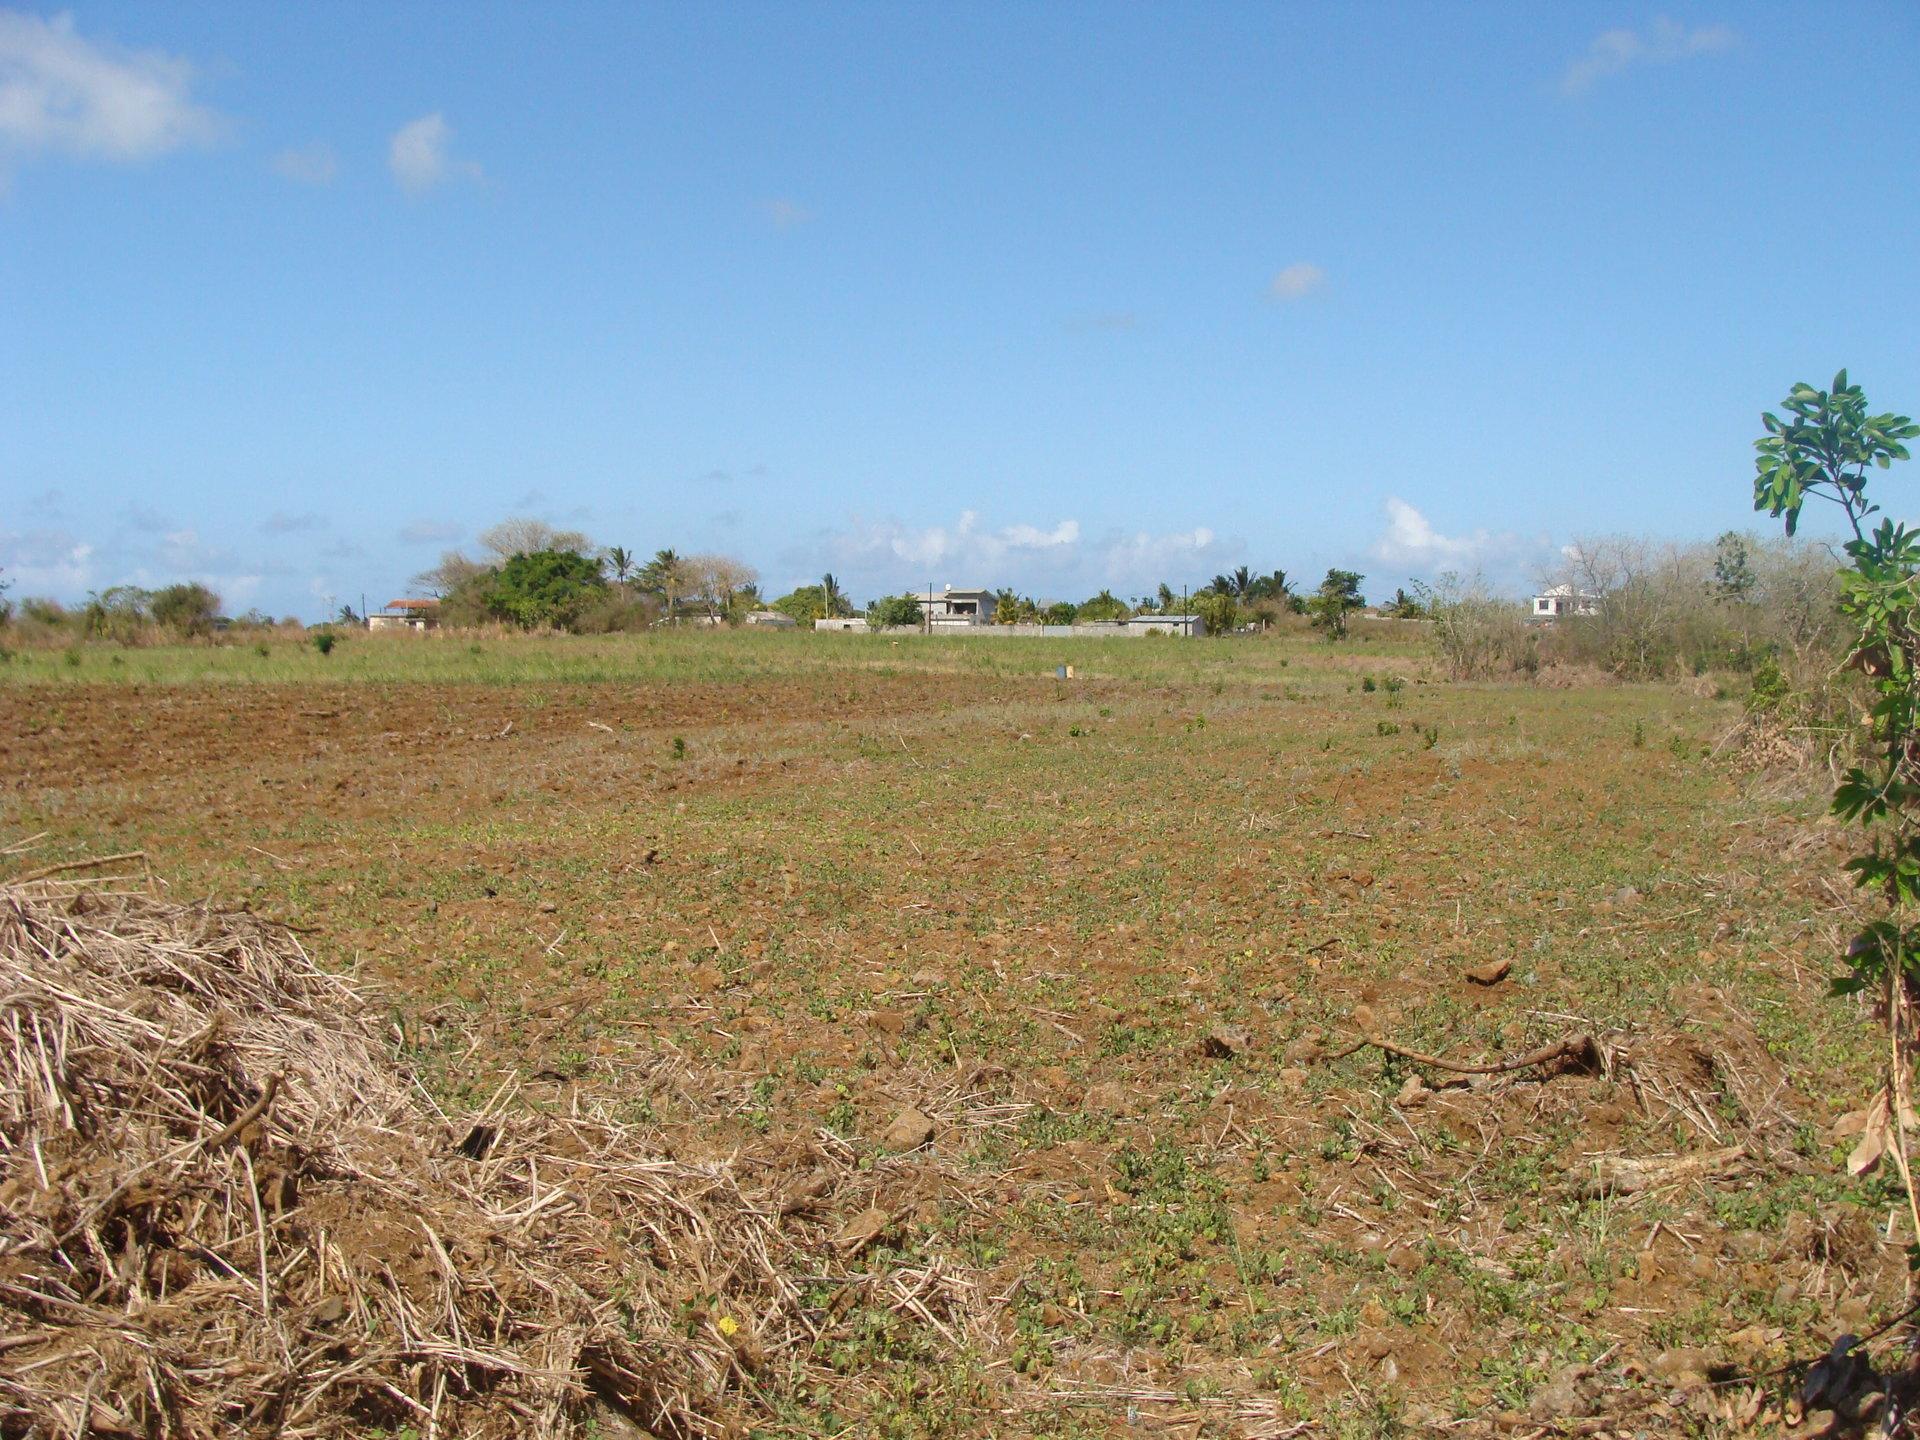 Land (agricultural)